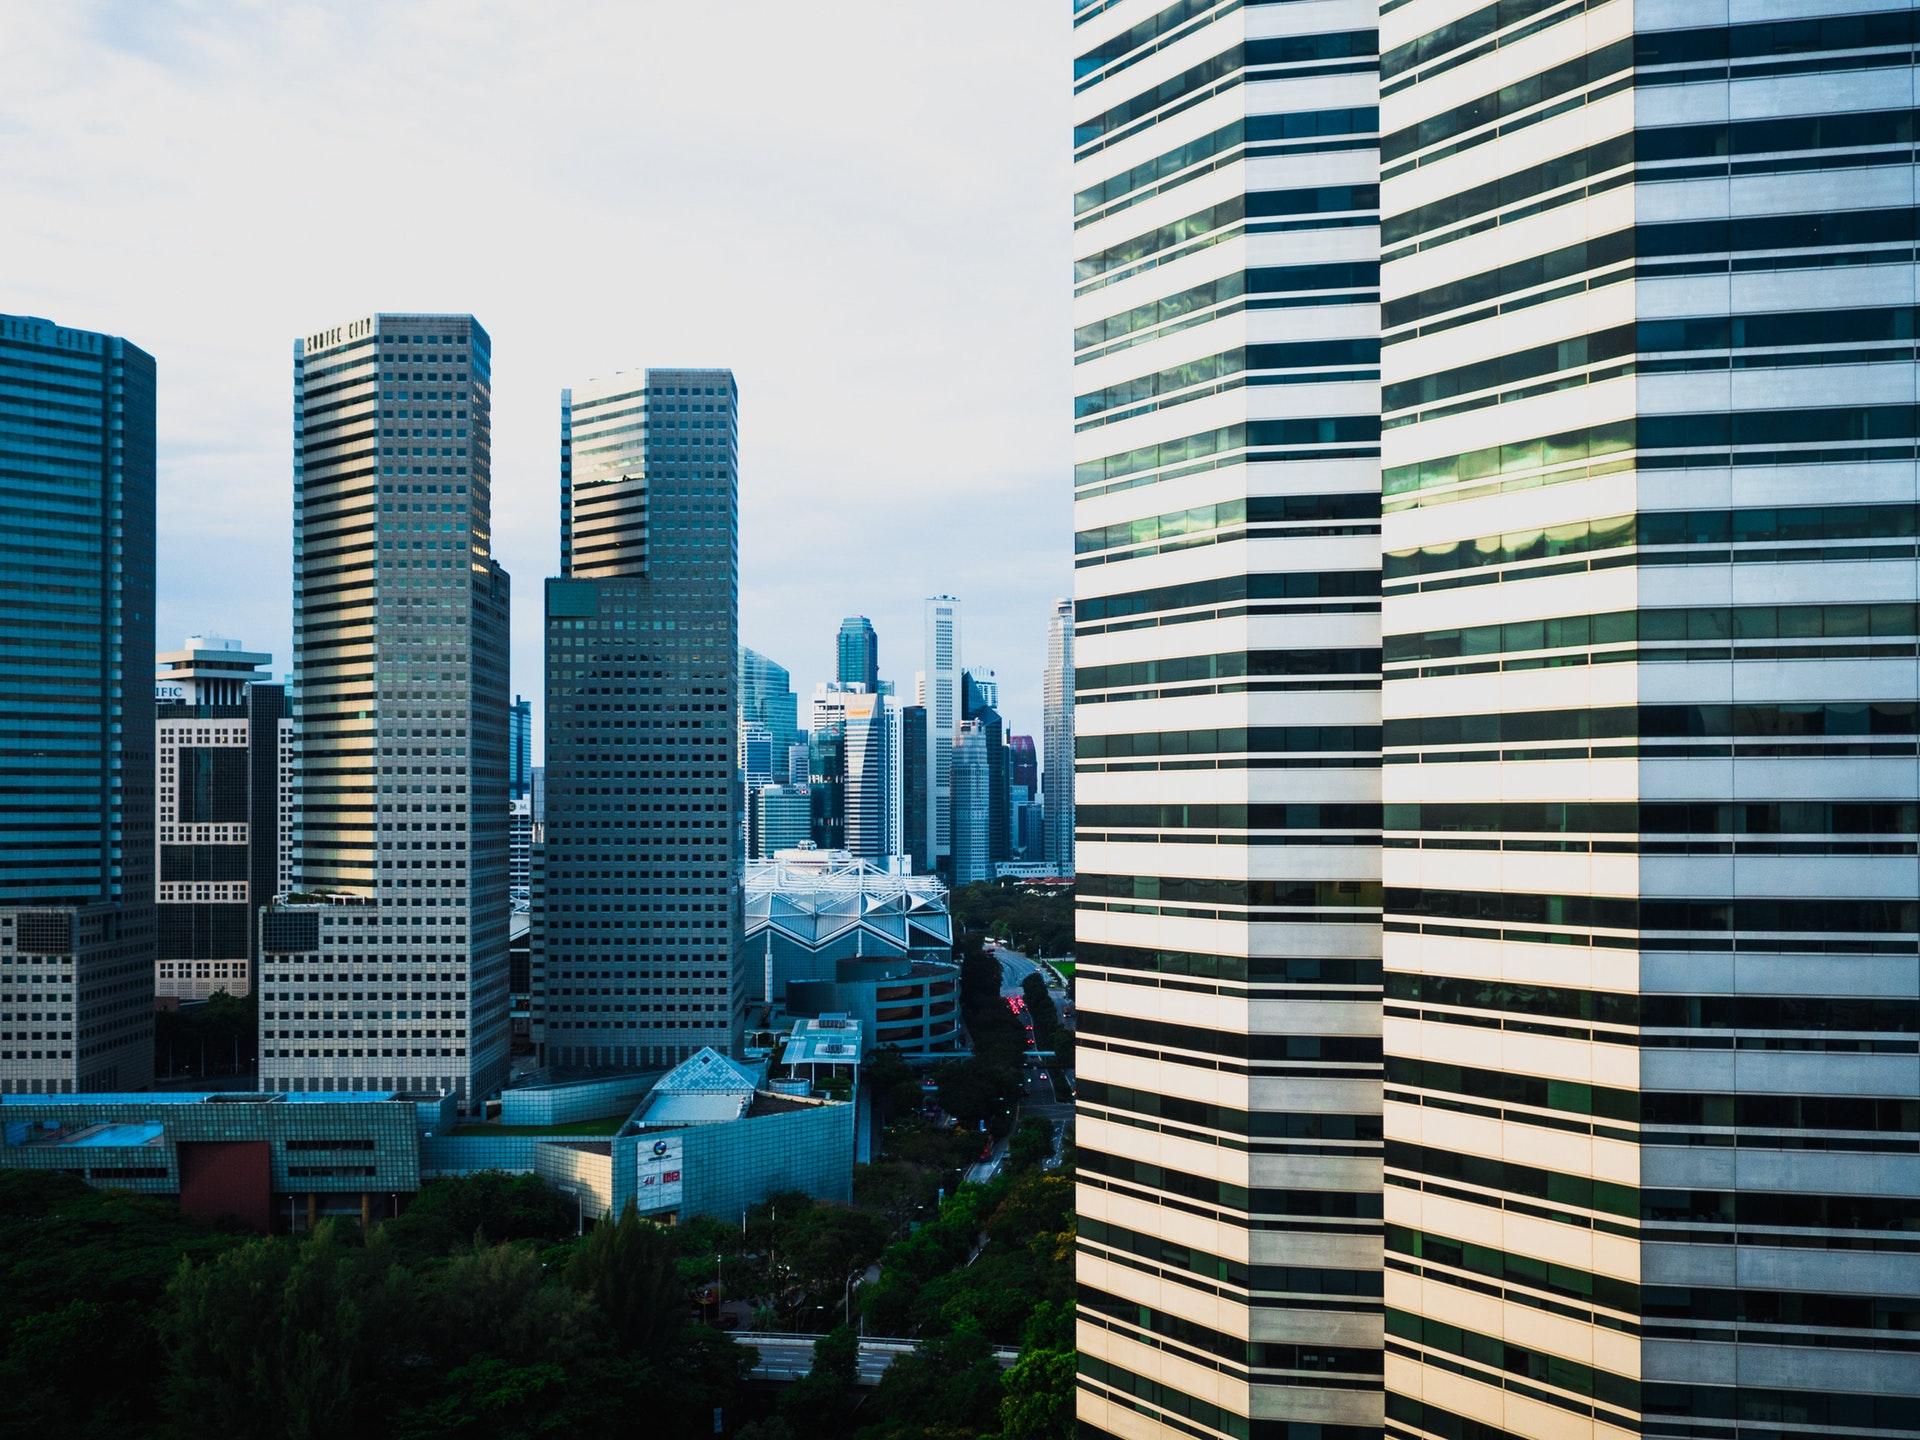 Weber Shandwick Names Hin-Yan Wong SVP, Planning & Analytics, Singapore